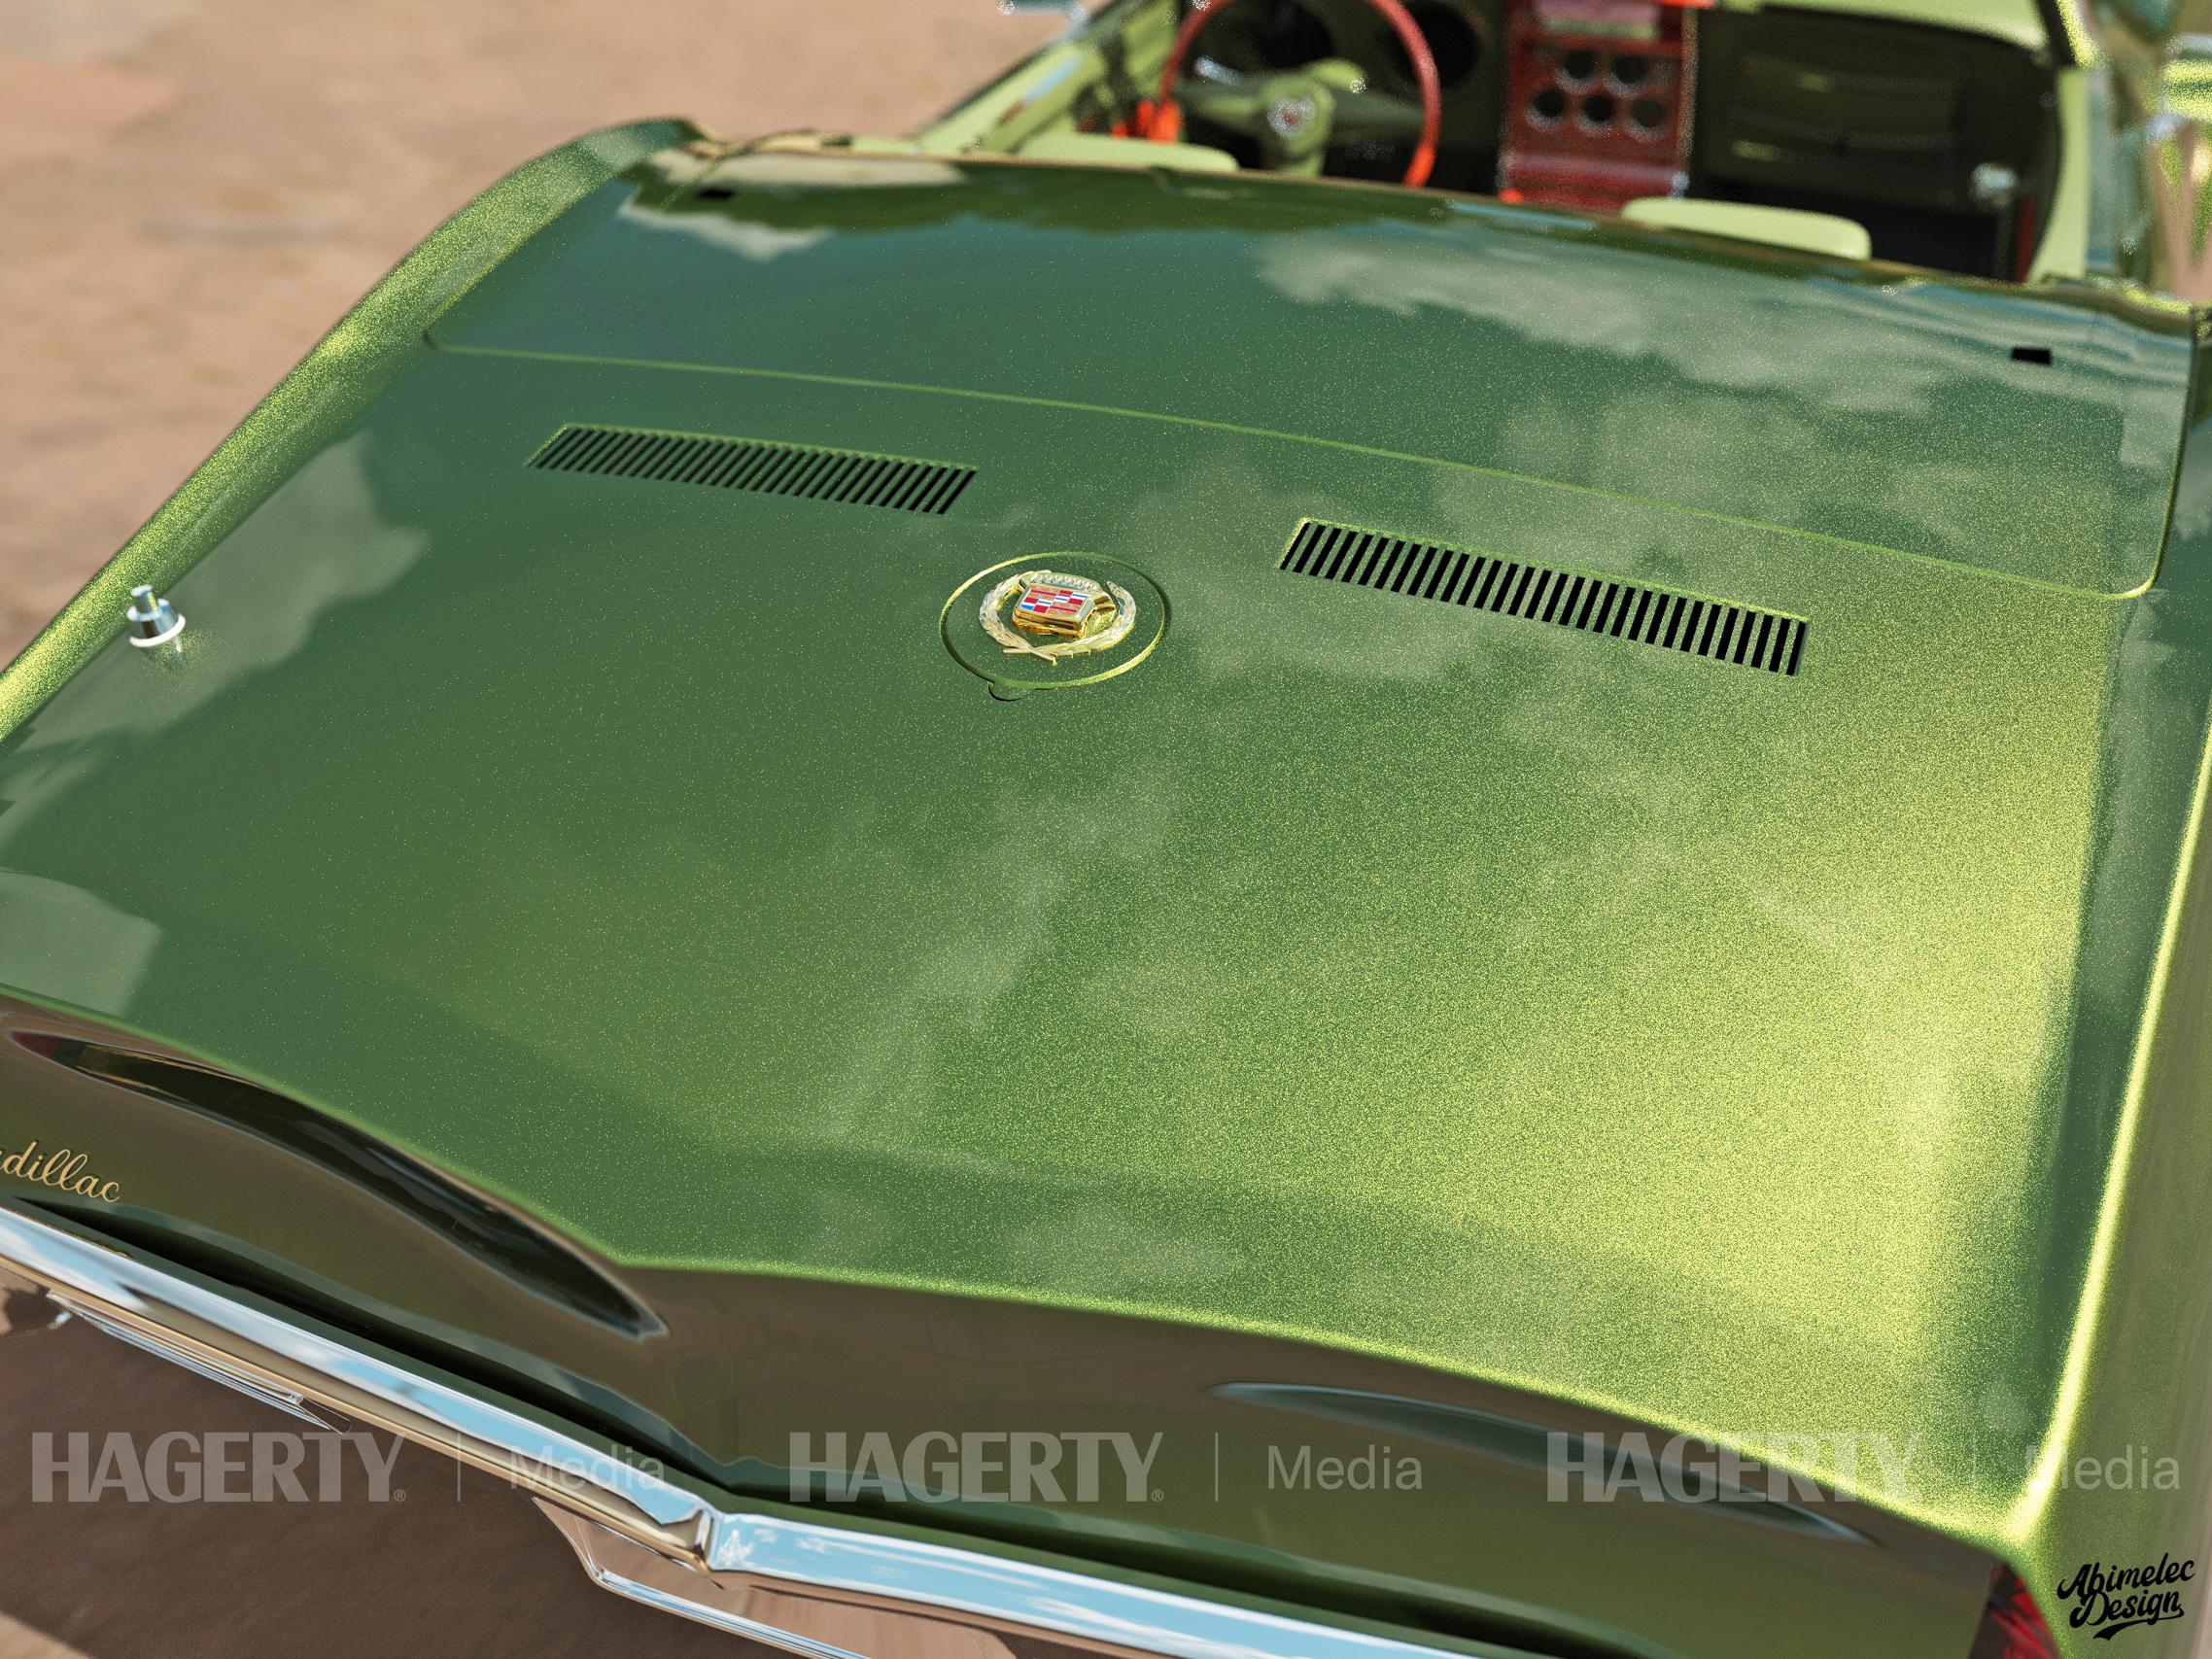 68 Cadillac Roadster DeVille rear gas cap emblem